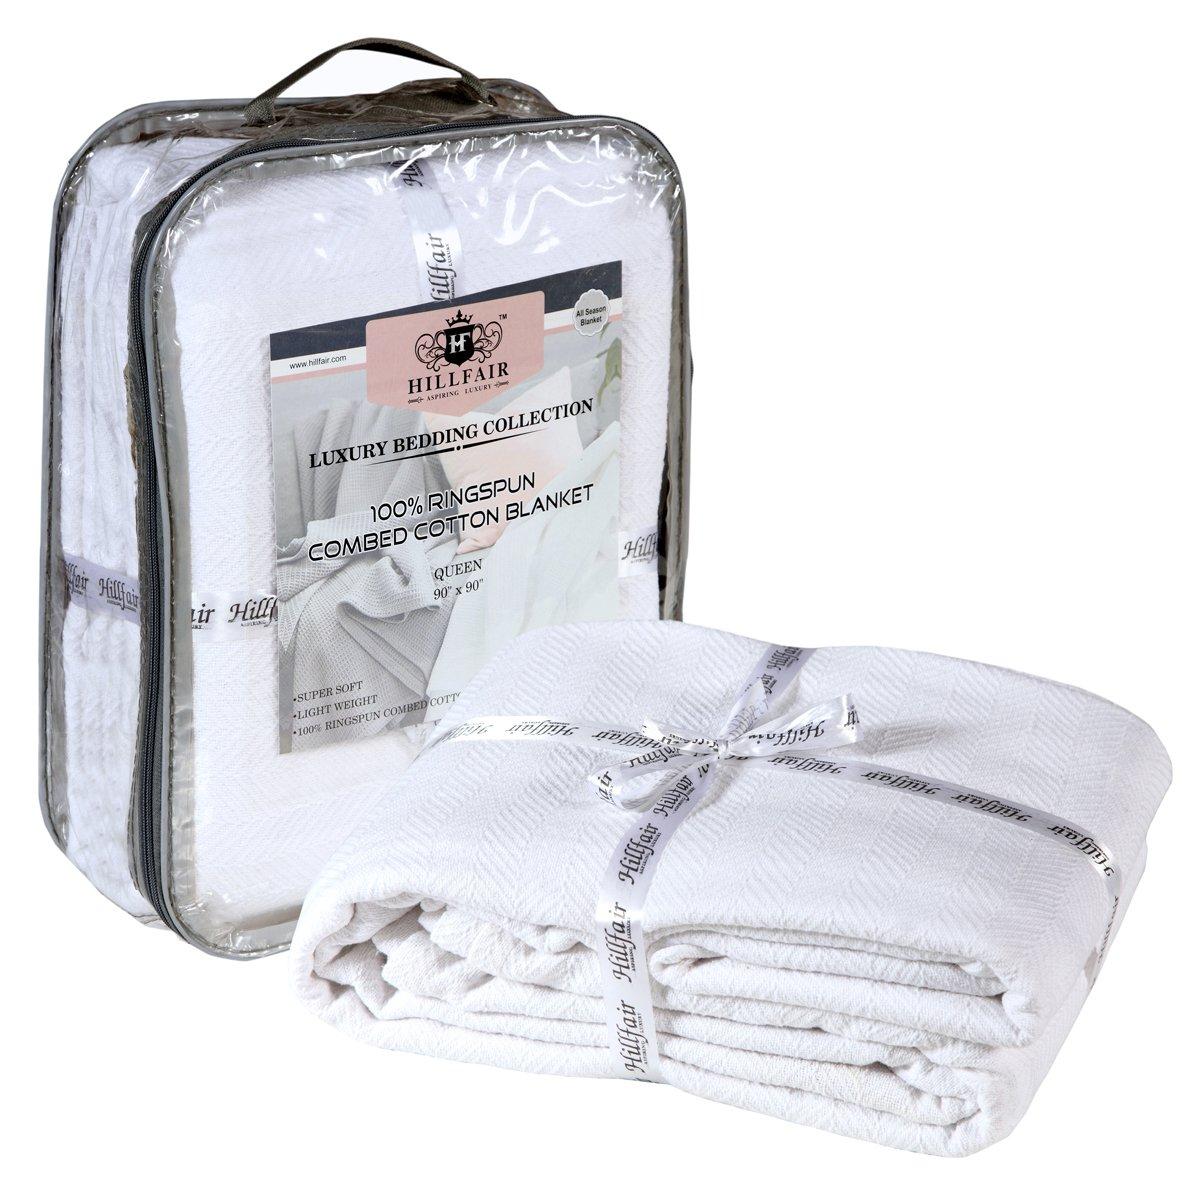 HILLFAIR 100% Ringspun Combed Cotton Blanket - Herringbone Cotton blanket- Twin Blankets - Cotton Thermal Blankets - Soft Light Weight Cotton Blanket – Twin Bed Blankets– White Cotton Blankets by